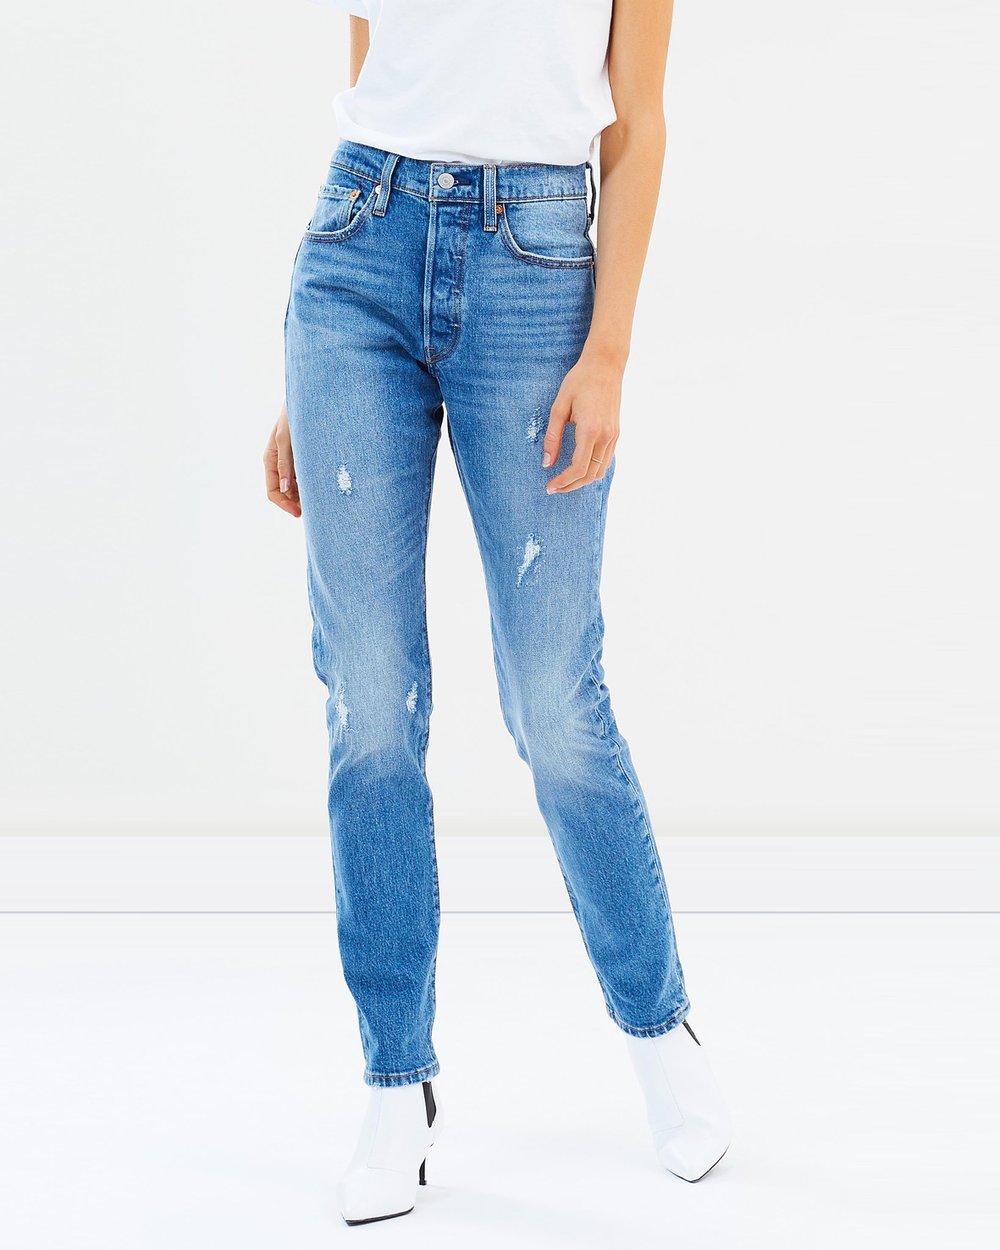 8175c5c4fc2c 501 Skinny Jeans by Levi's Online | THE ICONIC | Australia